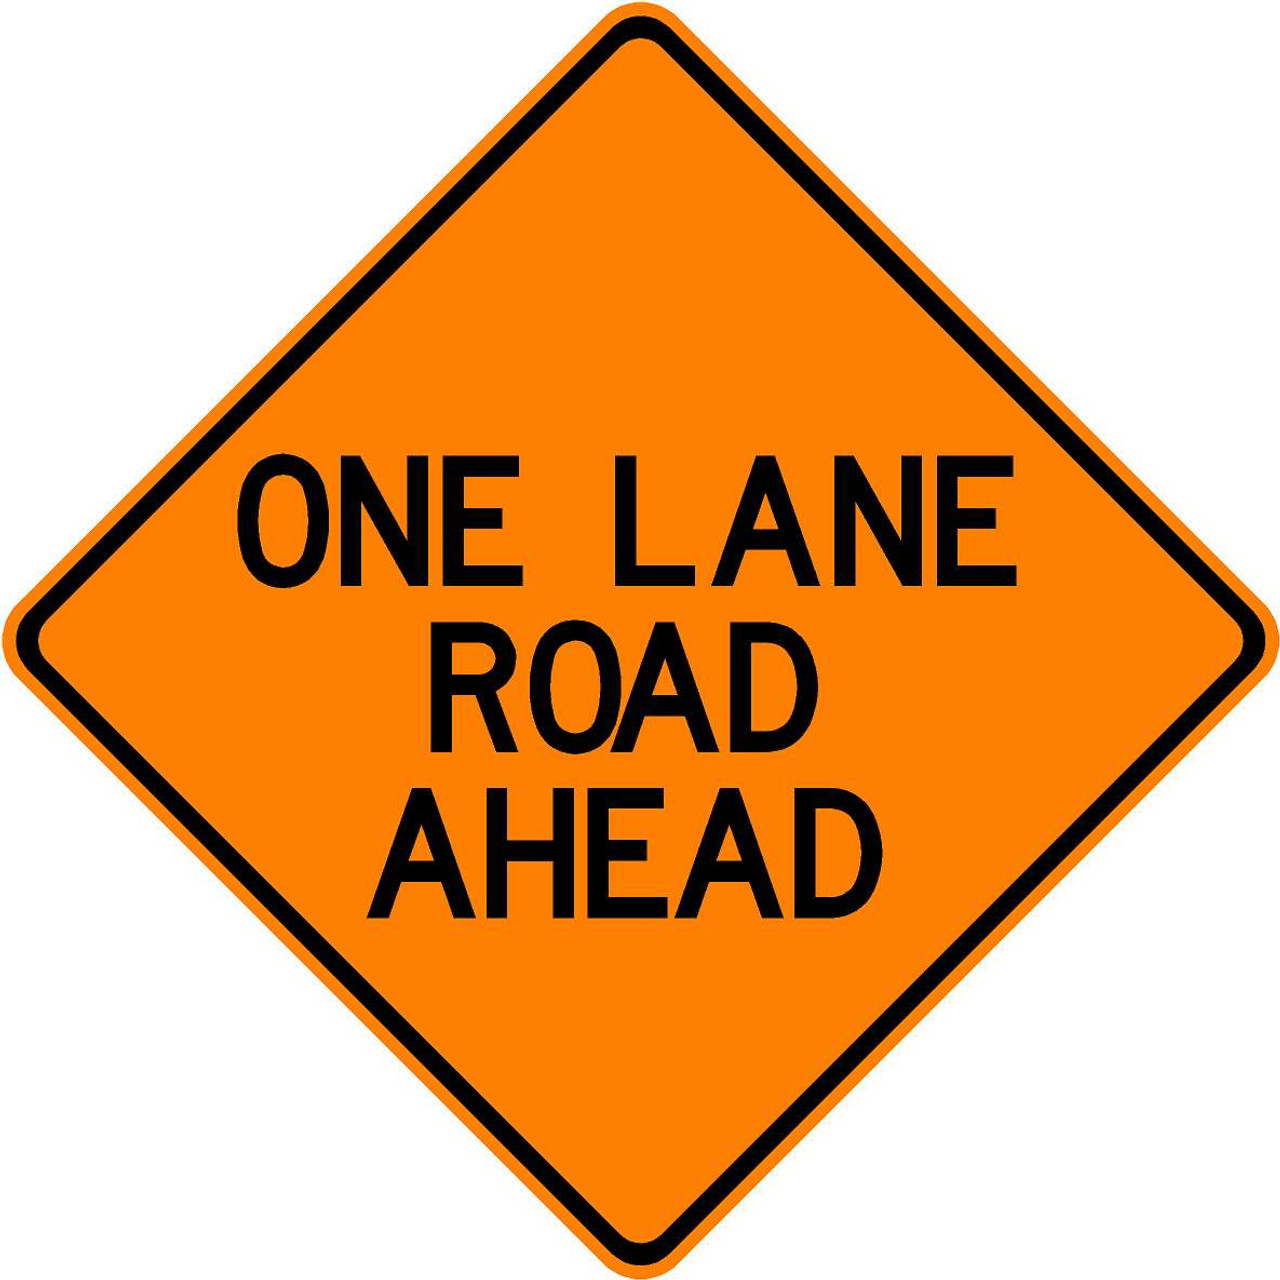 "ONE LANE ROAD AHEAD - 48"" VINYL SIGN"